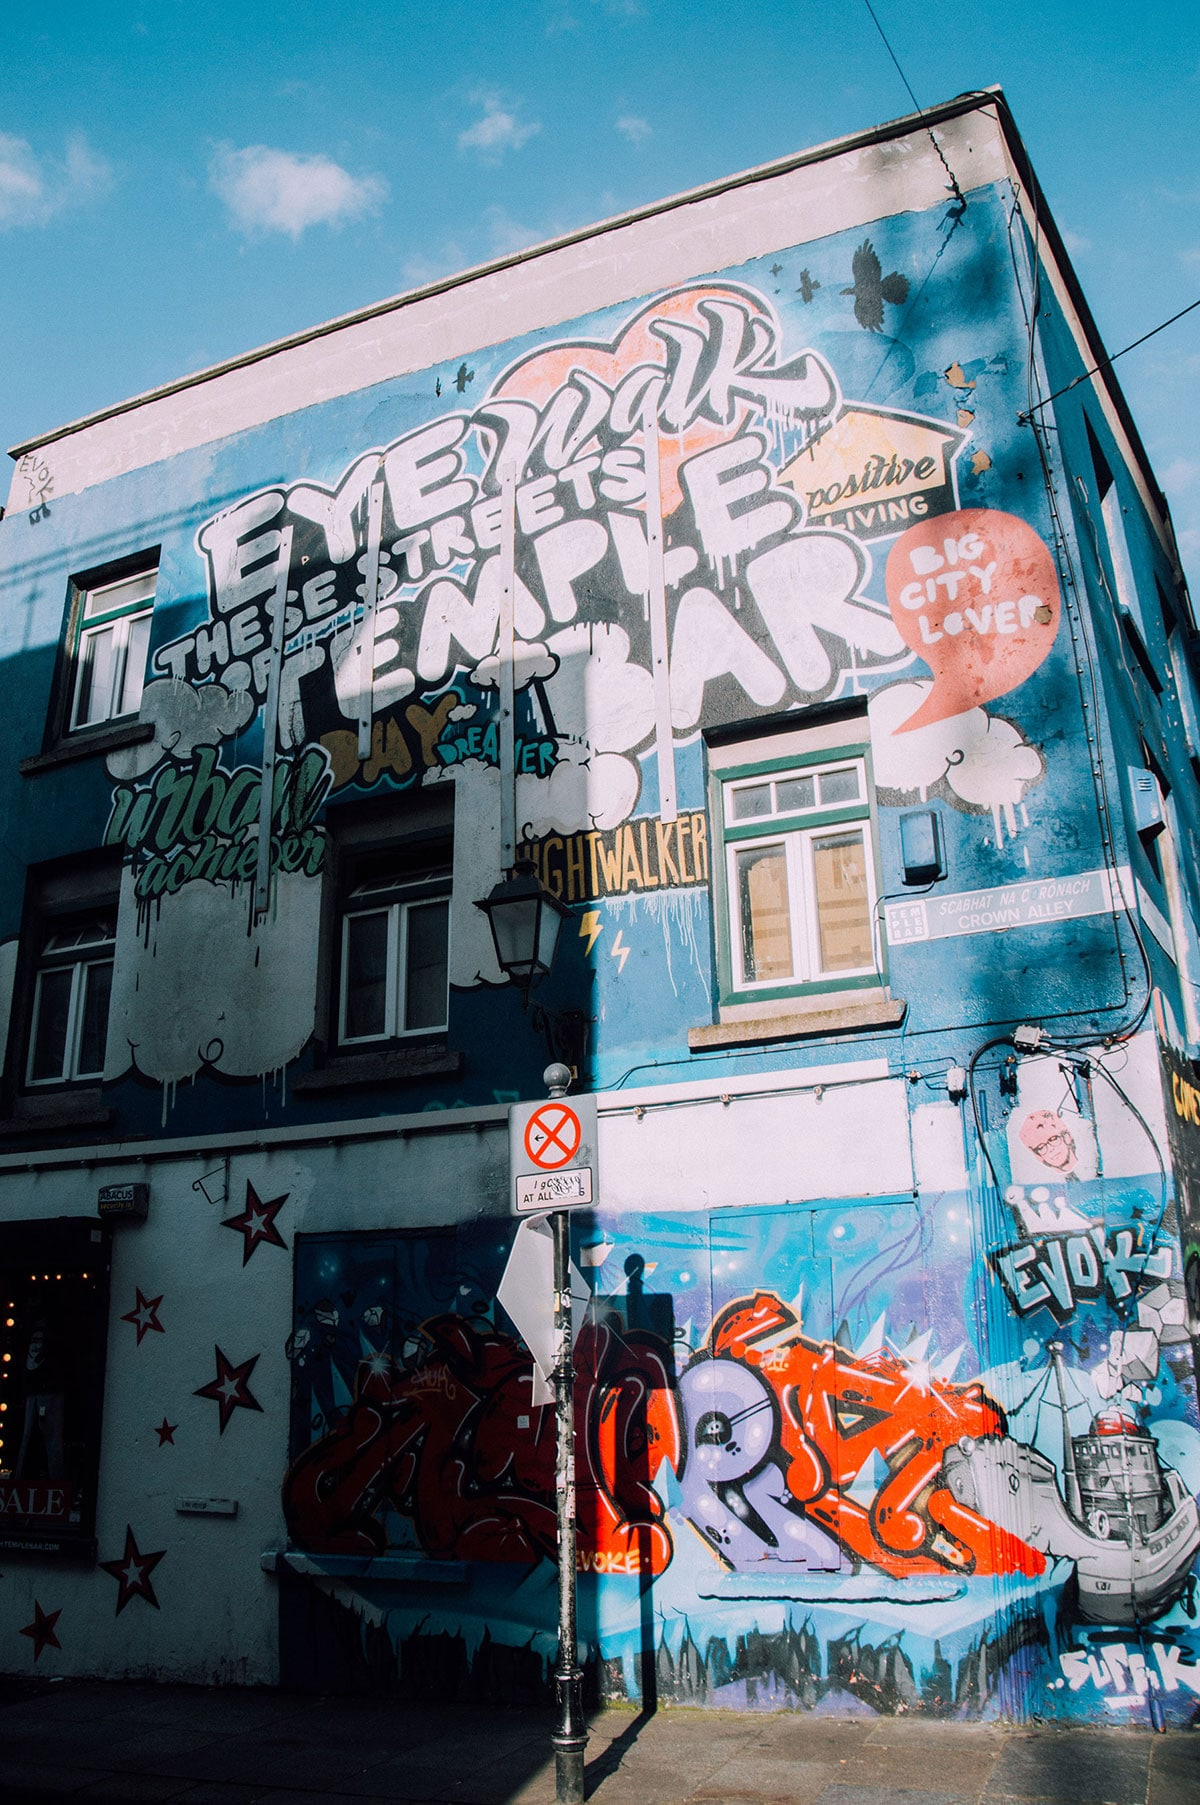 dublin_street-art_temple_bar